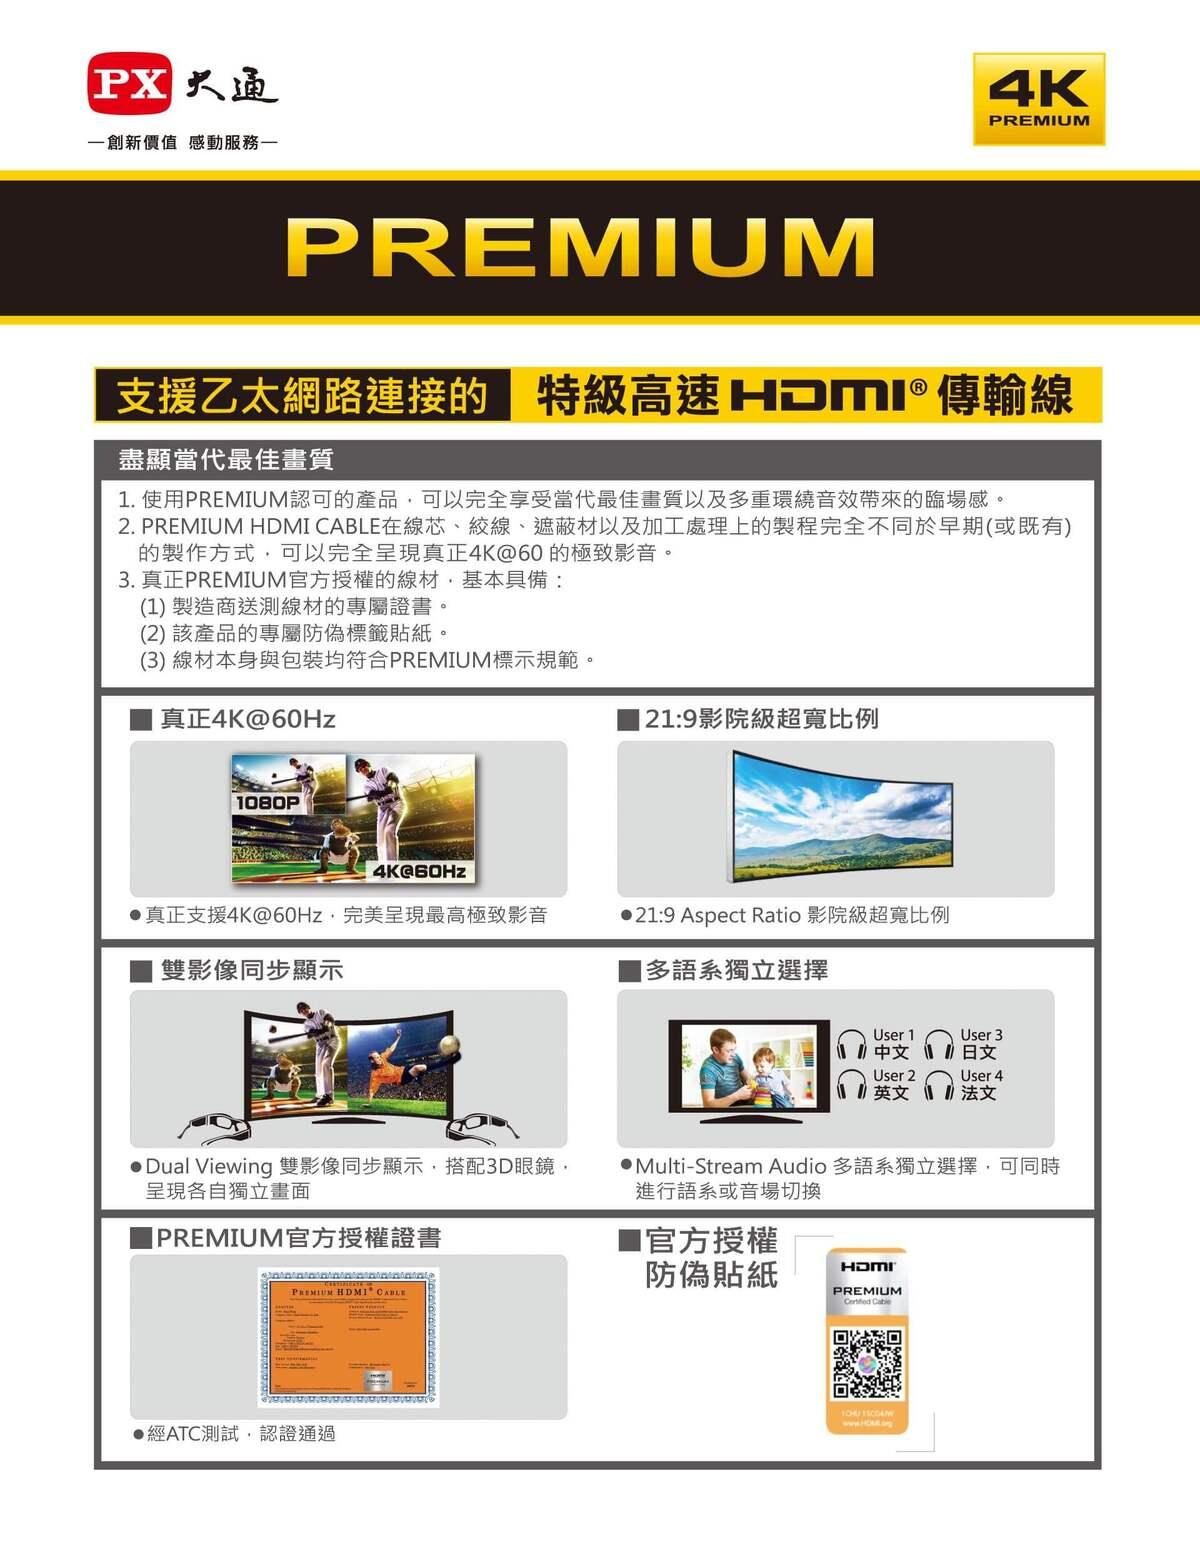 proimages/product/pro-02/pro02-001/HD2-5MX/HD2-5MX-4.jpg